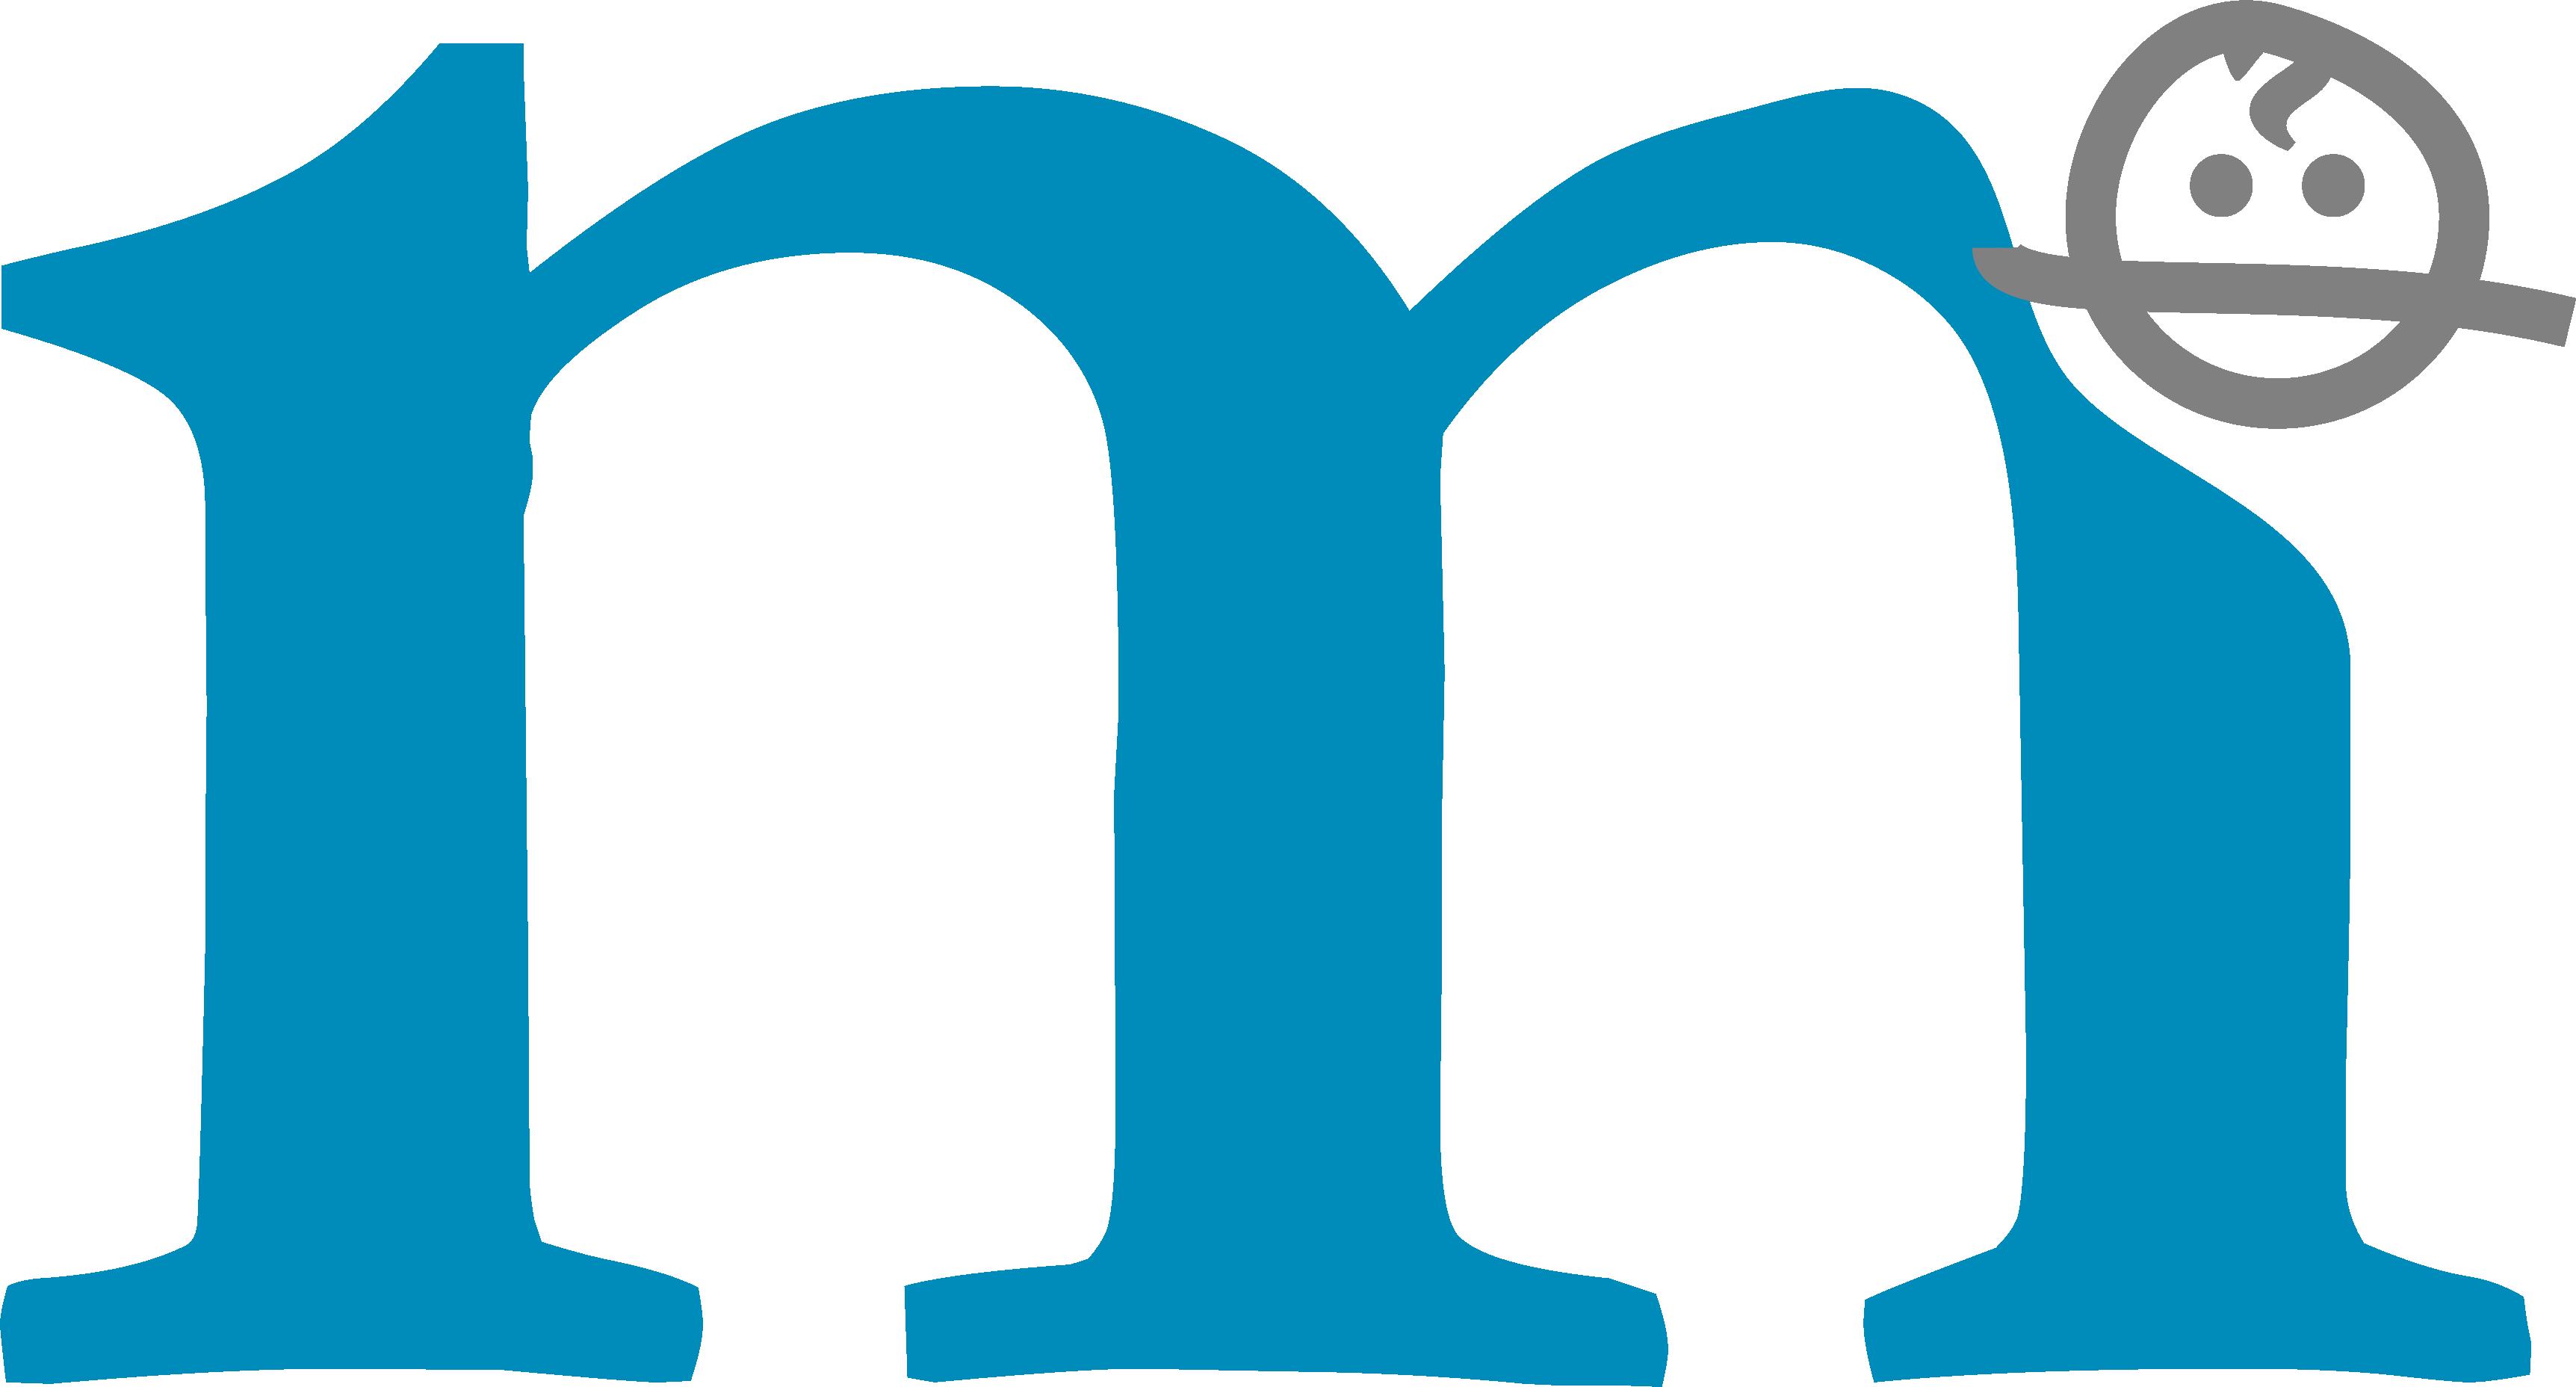 New logo feat. Mr. Monday